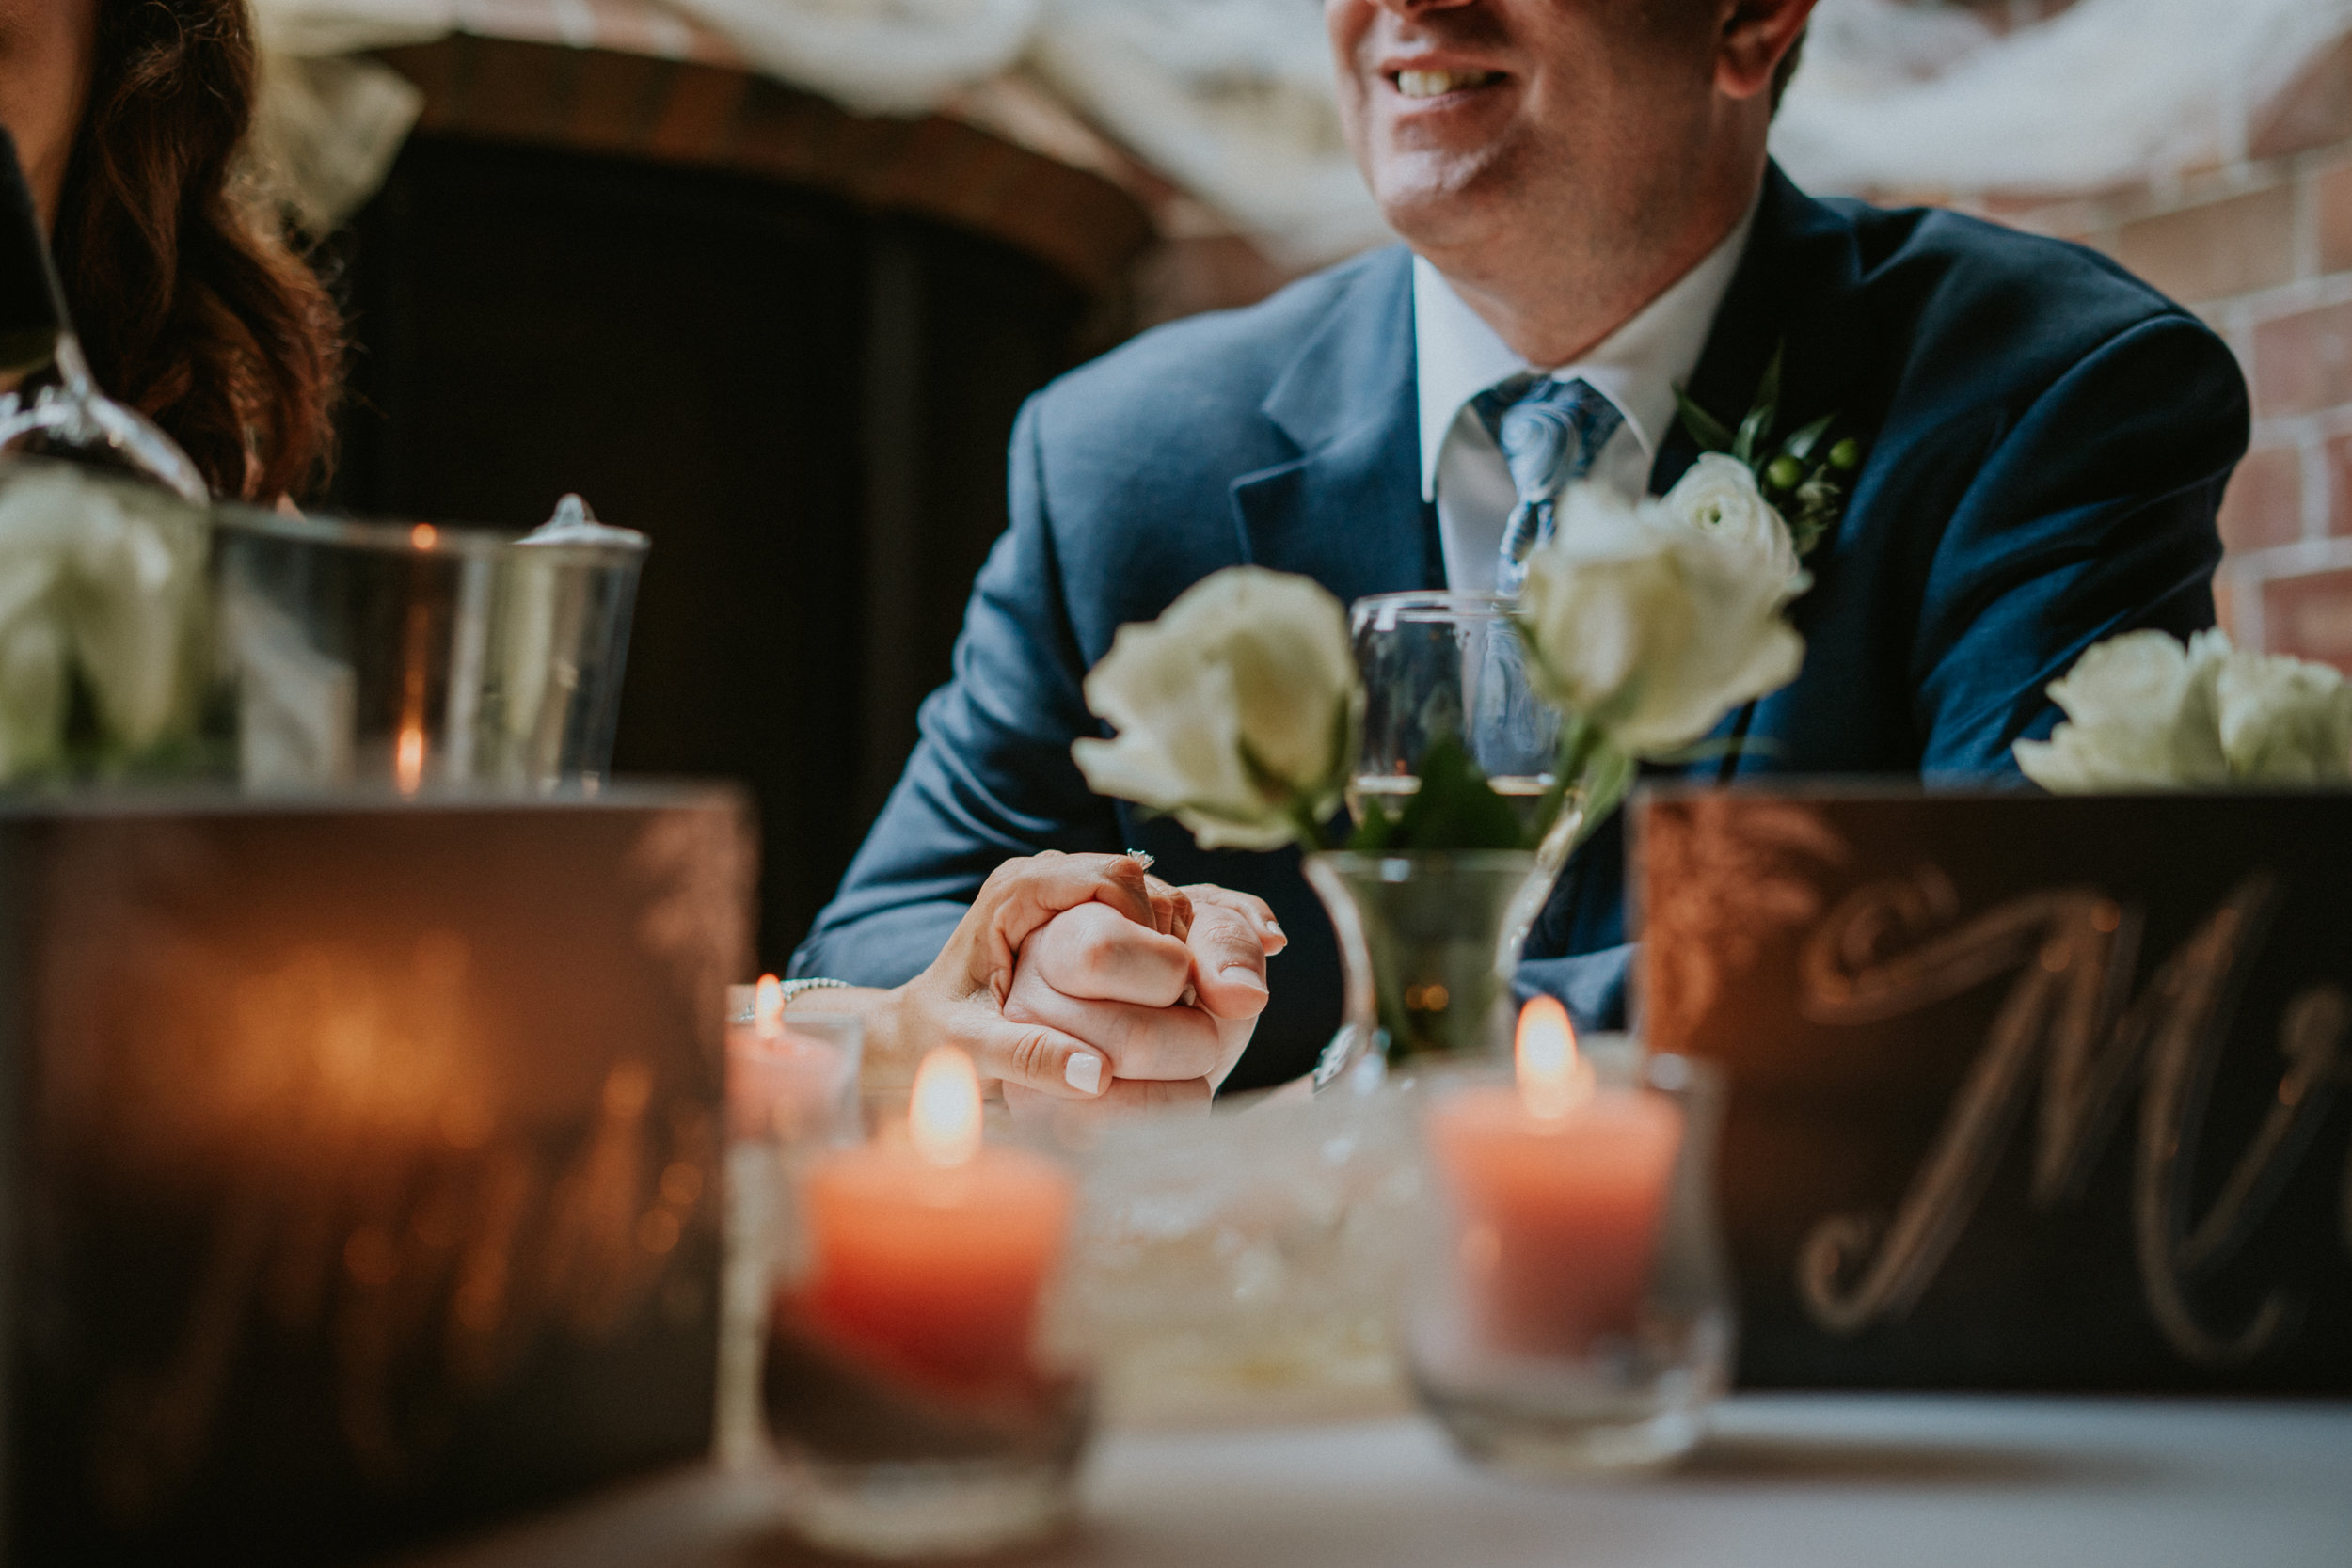 Capitola-Santa-Cruz-wedding-photographer-356.jpg